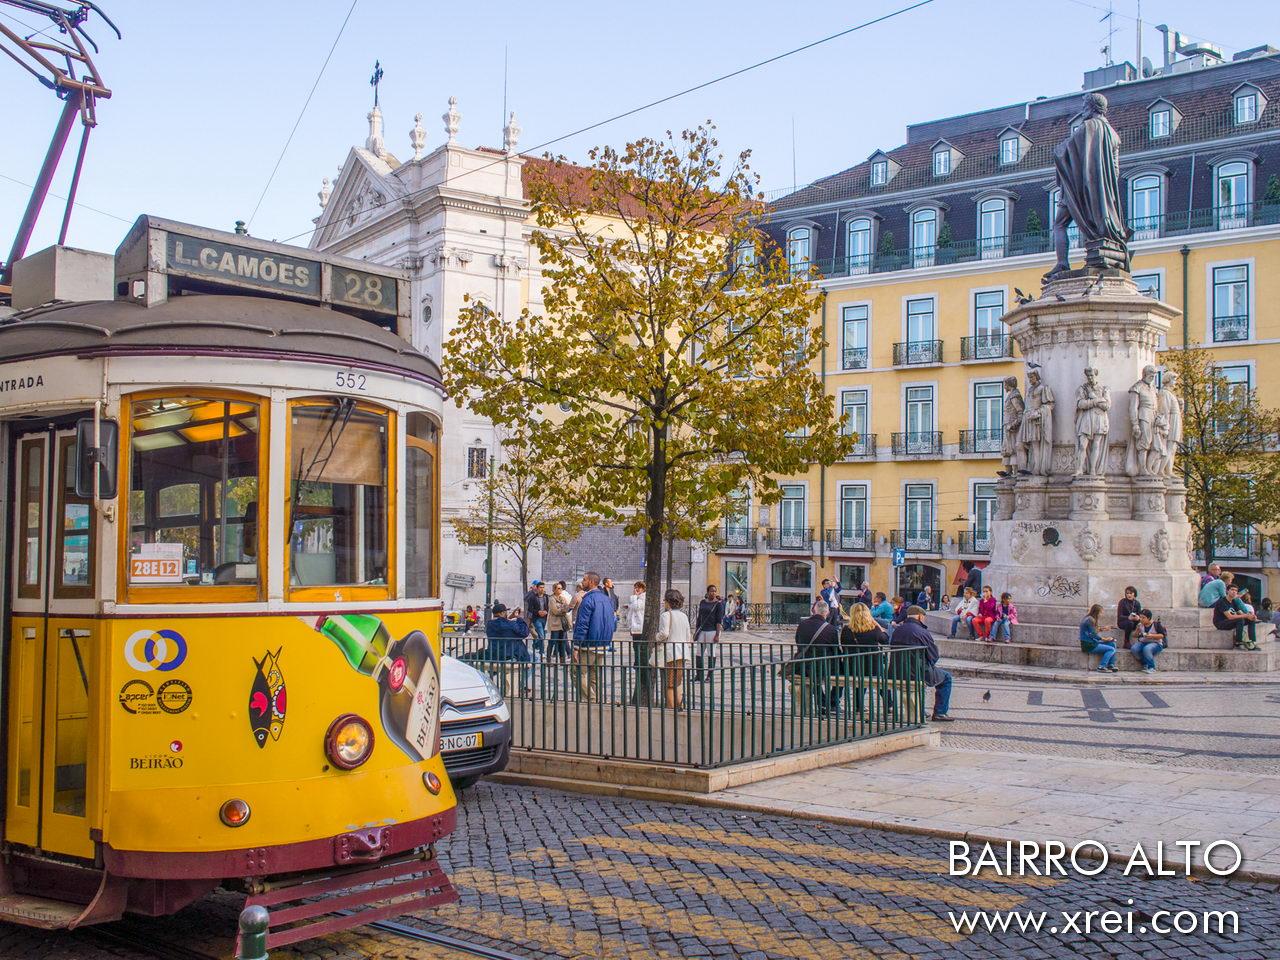 Luís de Camões Square, Bairro Alto in Lisbon